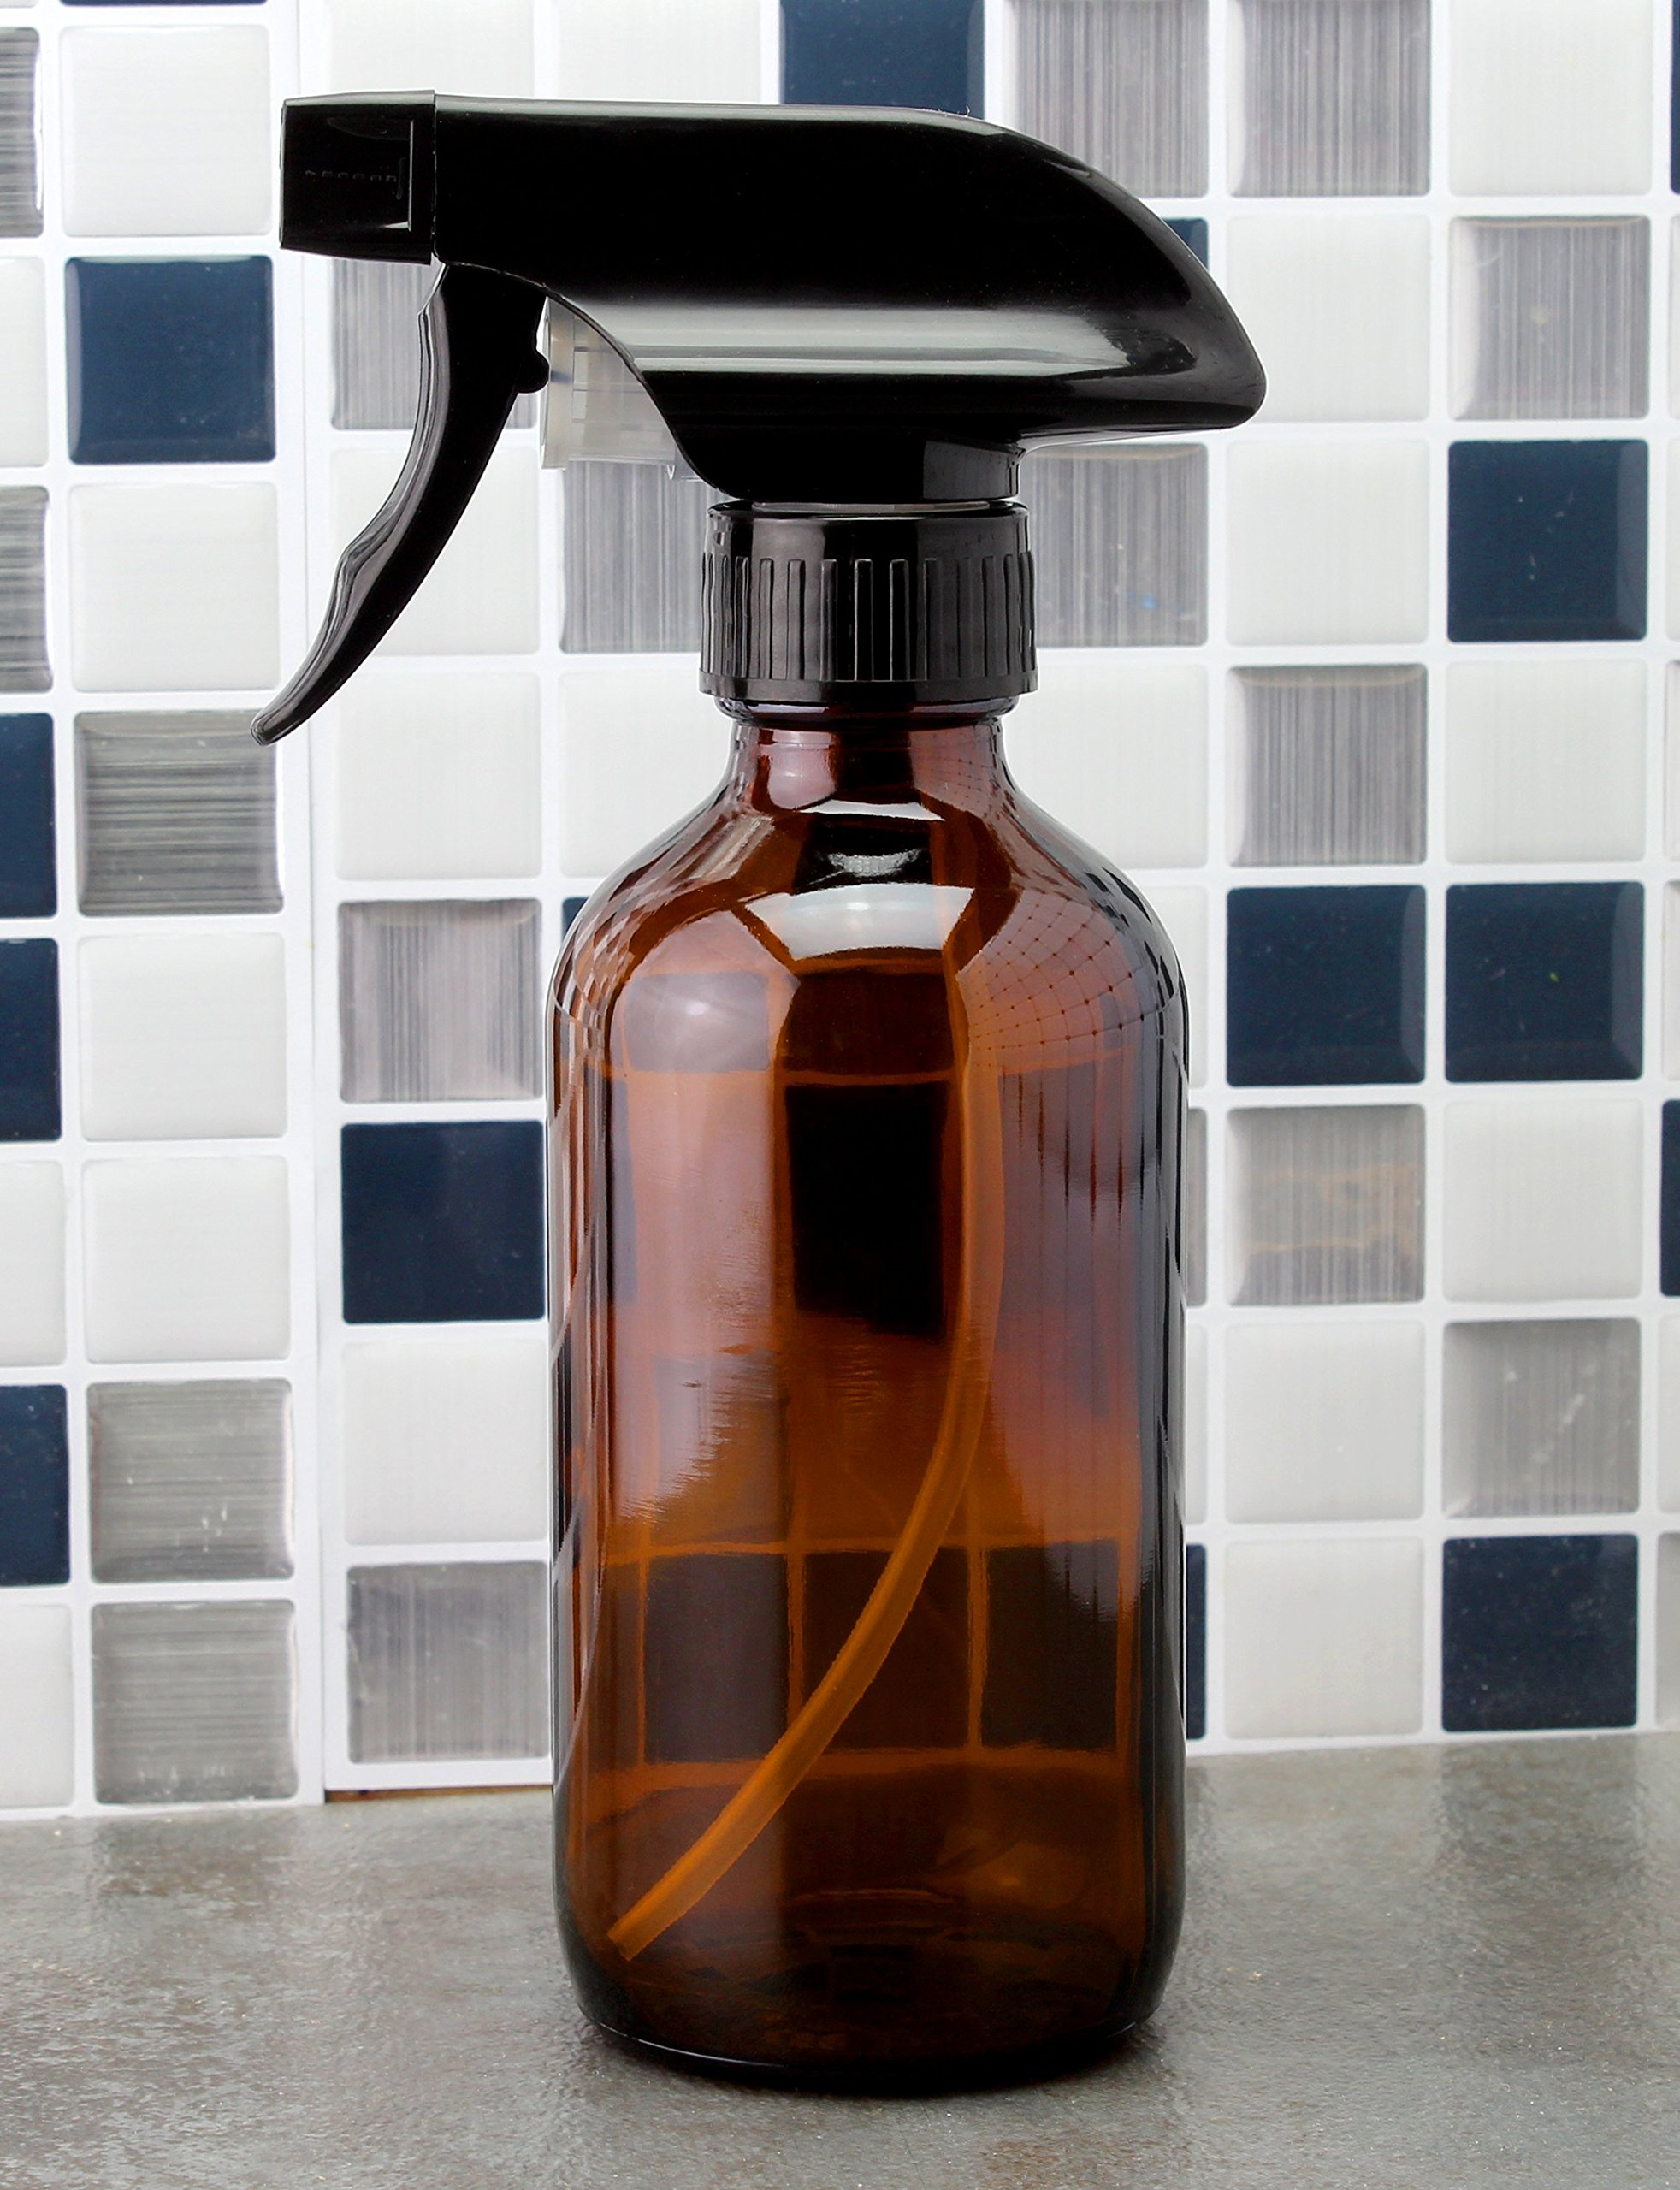 8oz Amber Glass Boston Round Spray Bottles (2 Pack); w/ Heavy Duty Mist & Stream Sprayers Perfect for Essential Oil Blends by Cornucopia Brands (Image #6)